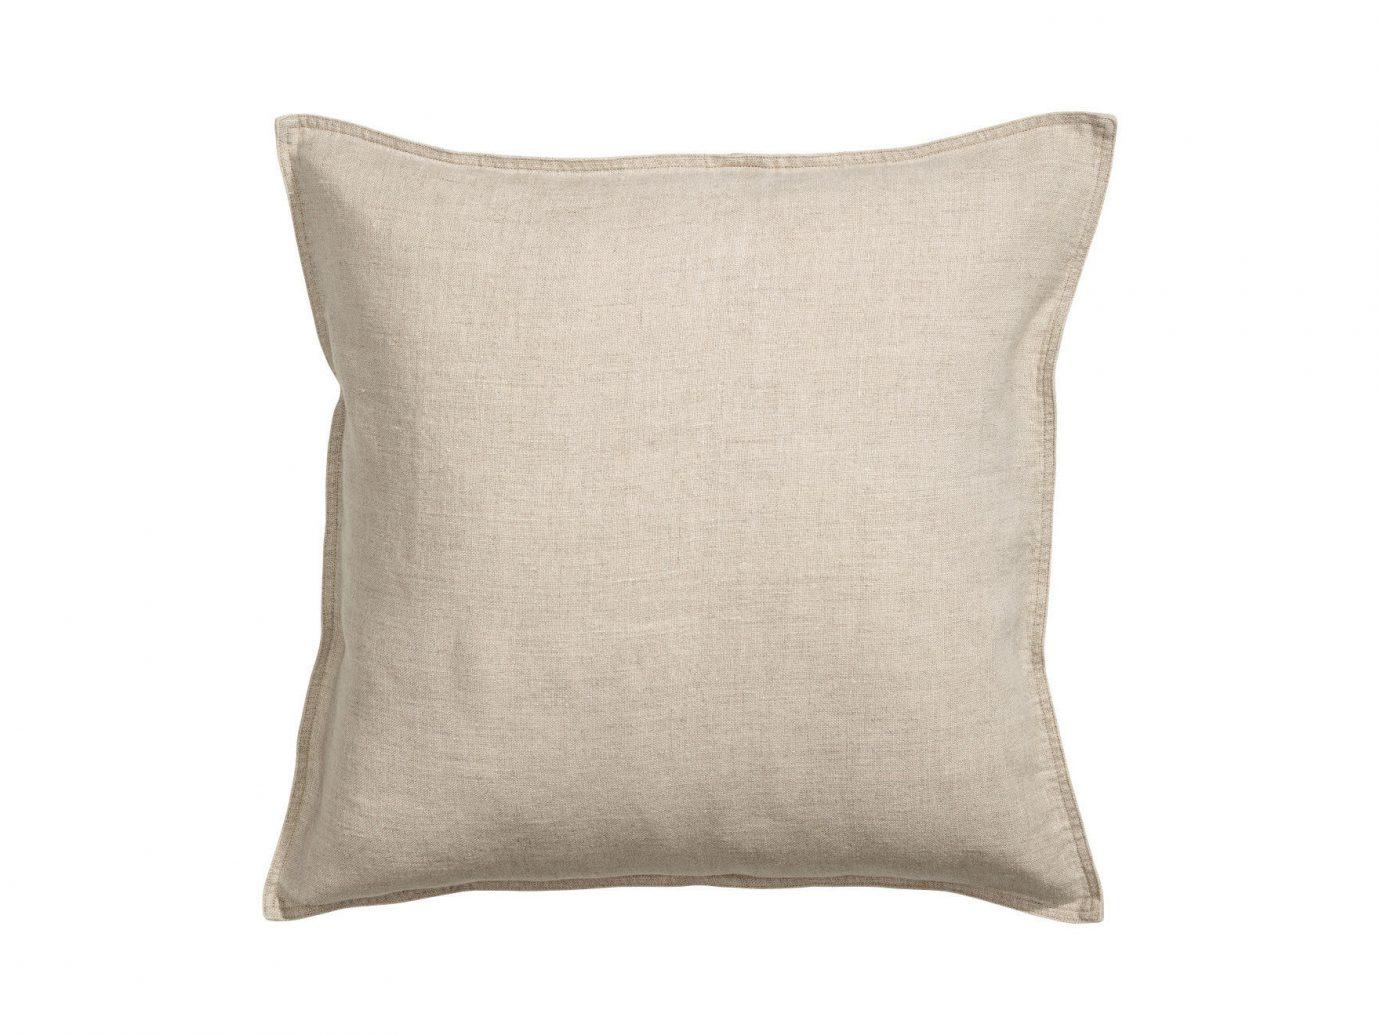 City Copenhagen Kyoto Marrakech Palm Springs Style + Design Travel Shop Tulum throw pillow cushion pillow beige product design